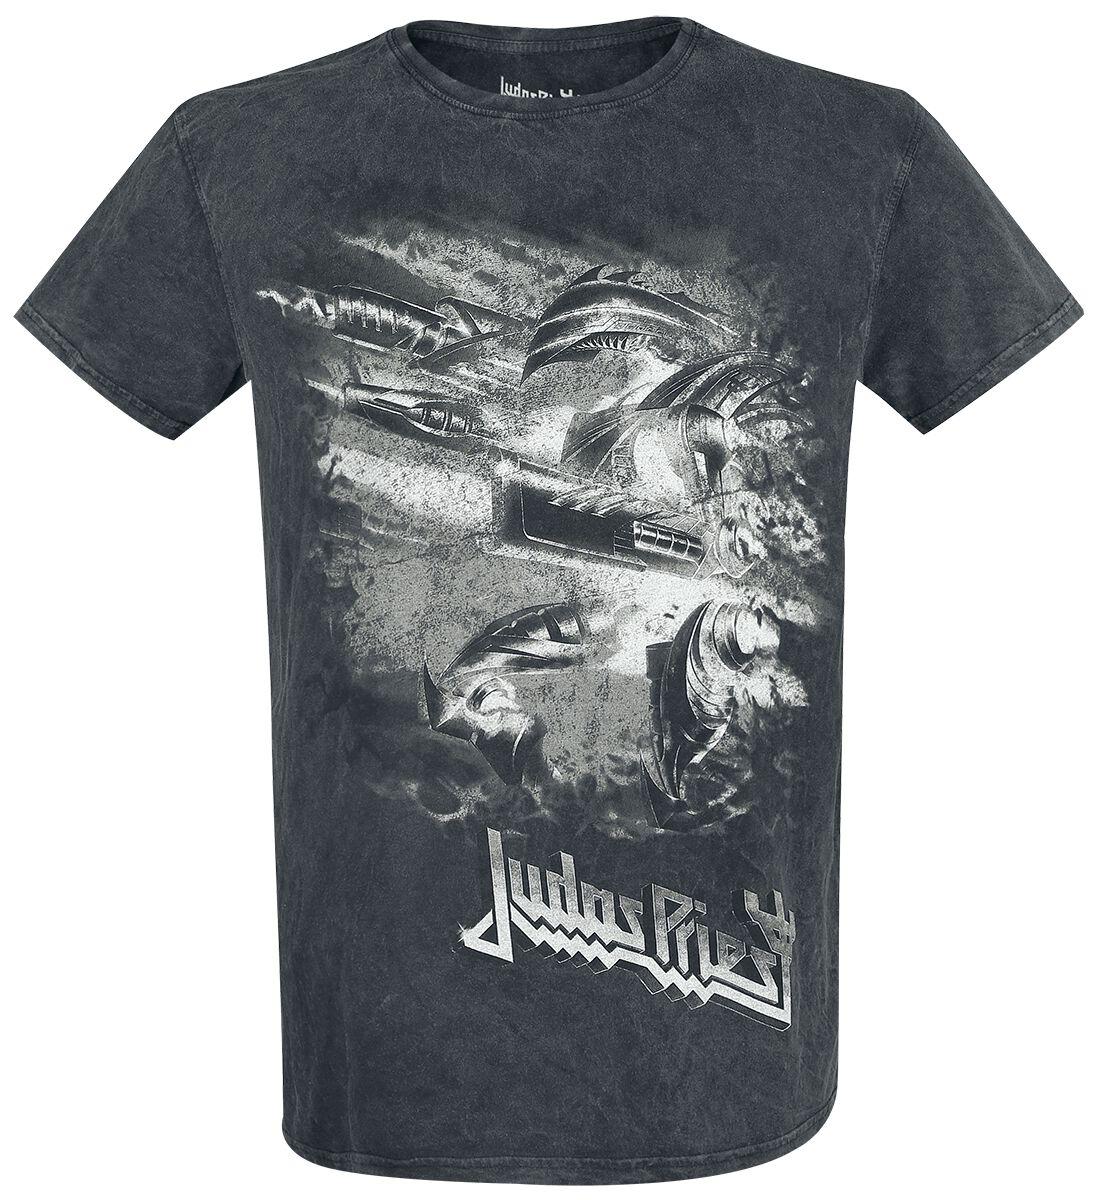 Image of   Judas Priest Firepower T-Shirt mørk grå